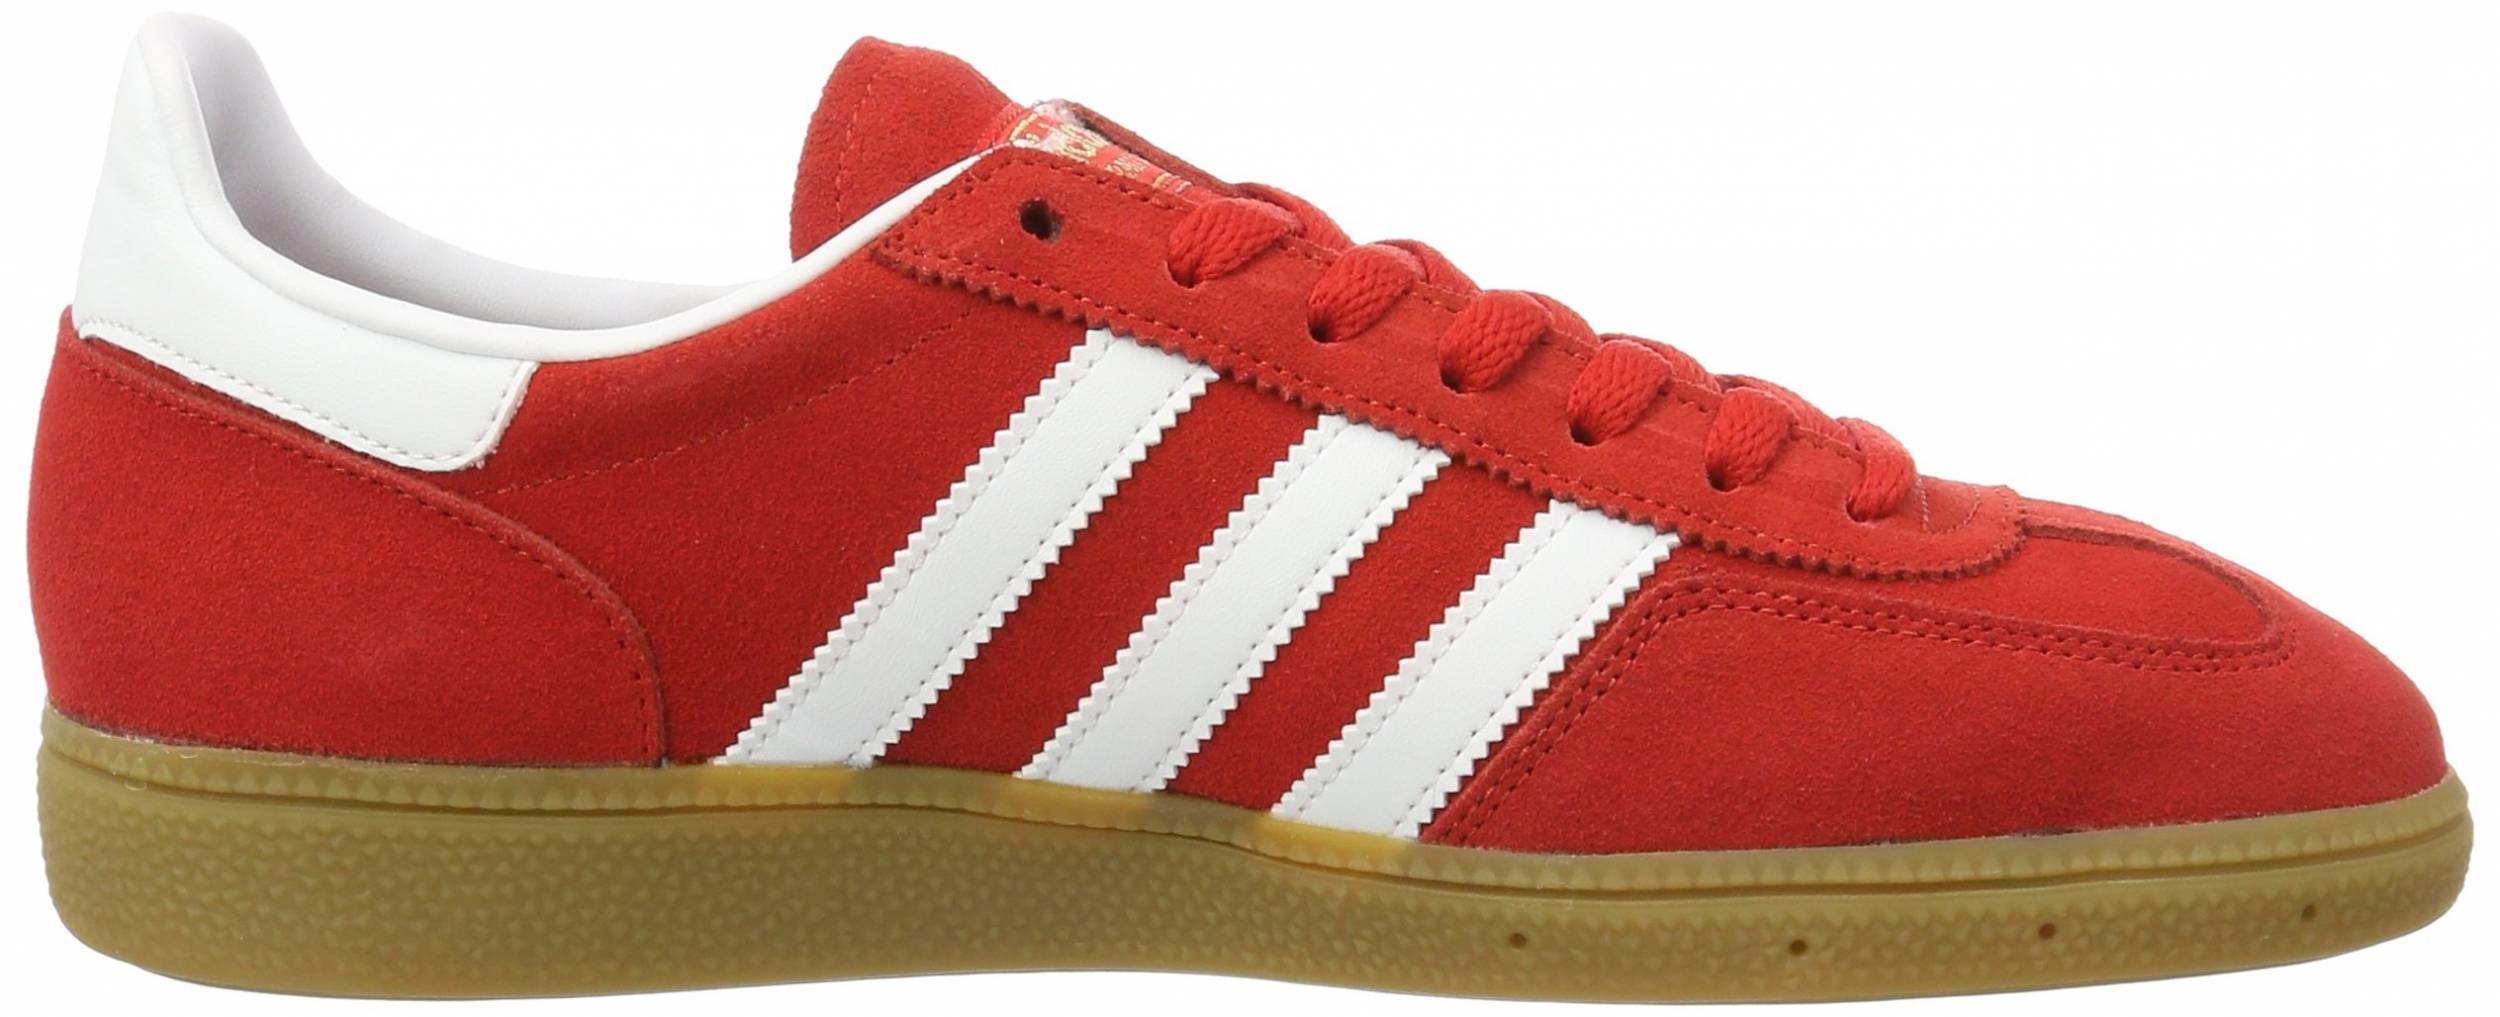 Volverse mucho puramente  Adidas Spezial sneakers (only $50) | RunRepeat